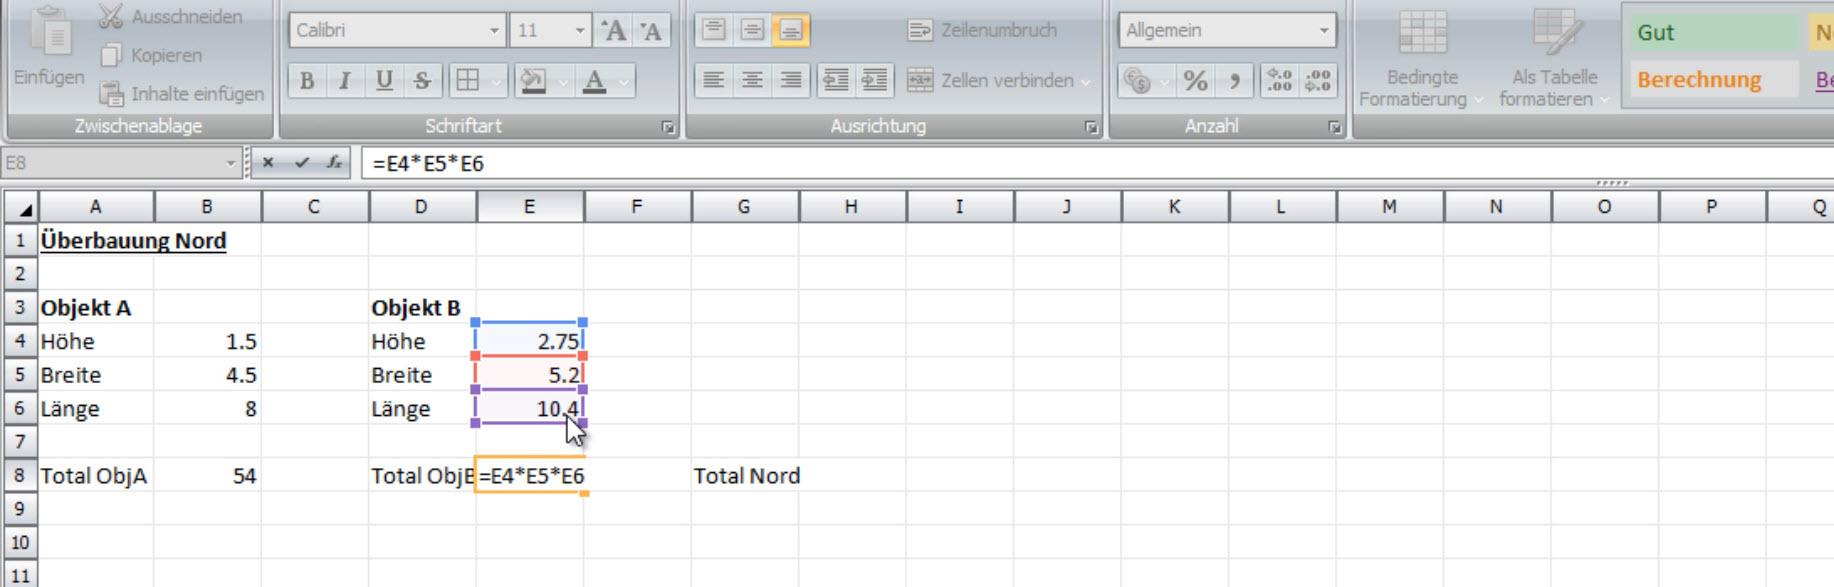 Excel-Ausmass Bild 2